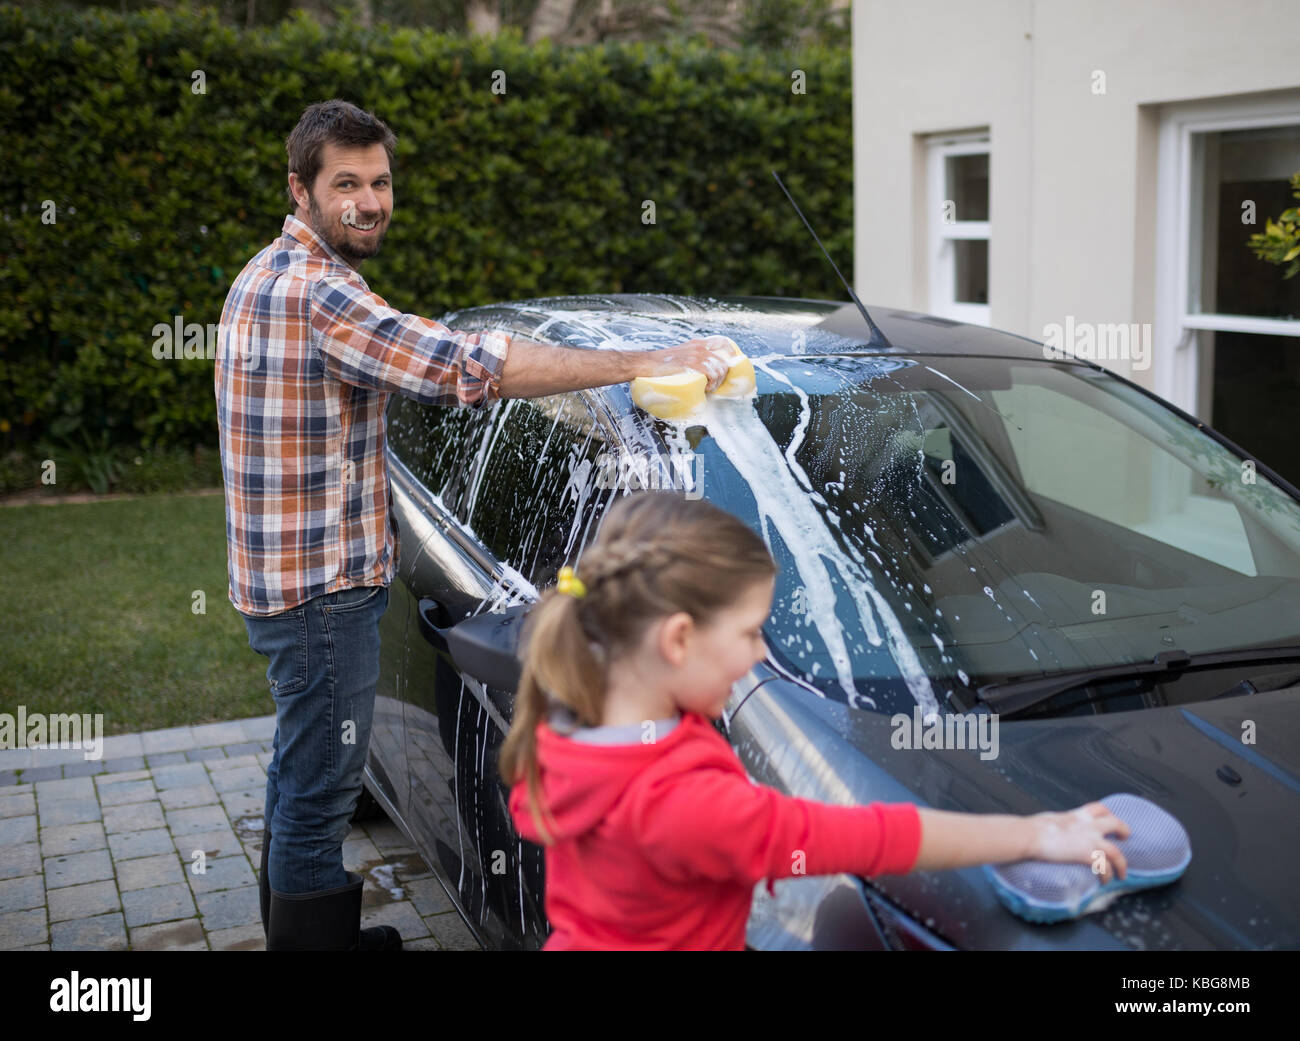 John naked teens washing cars xmovie